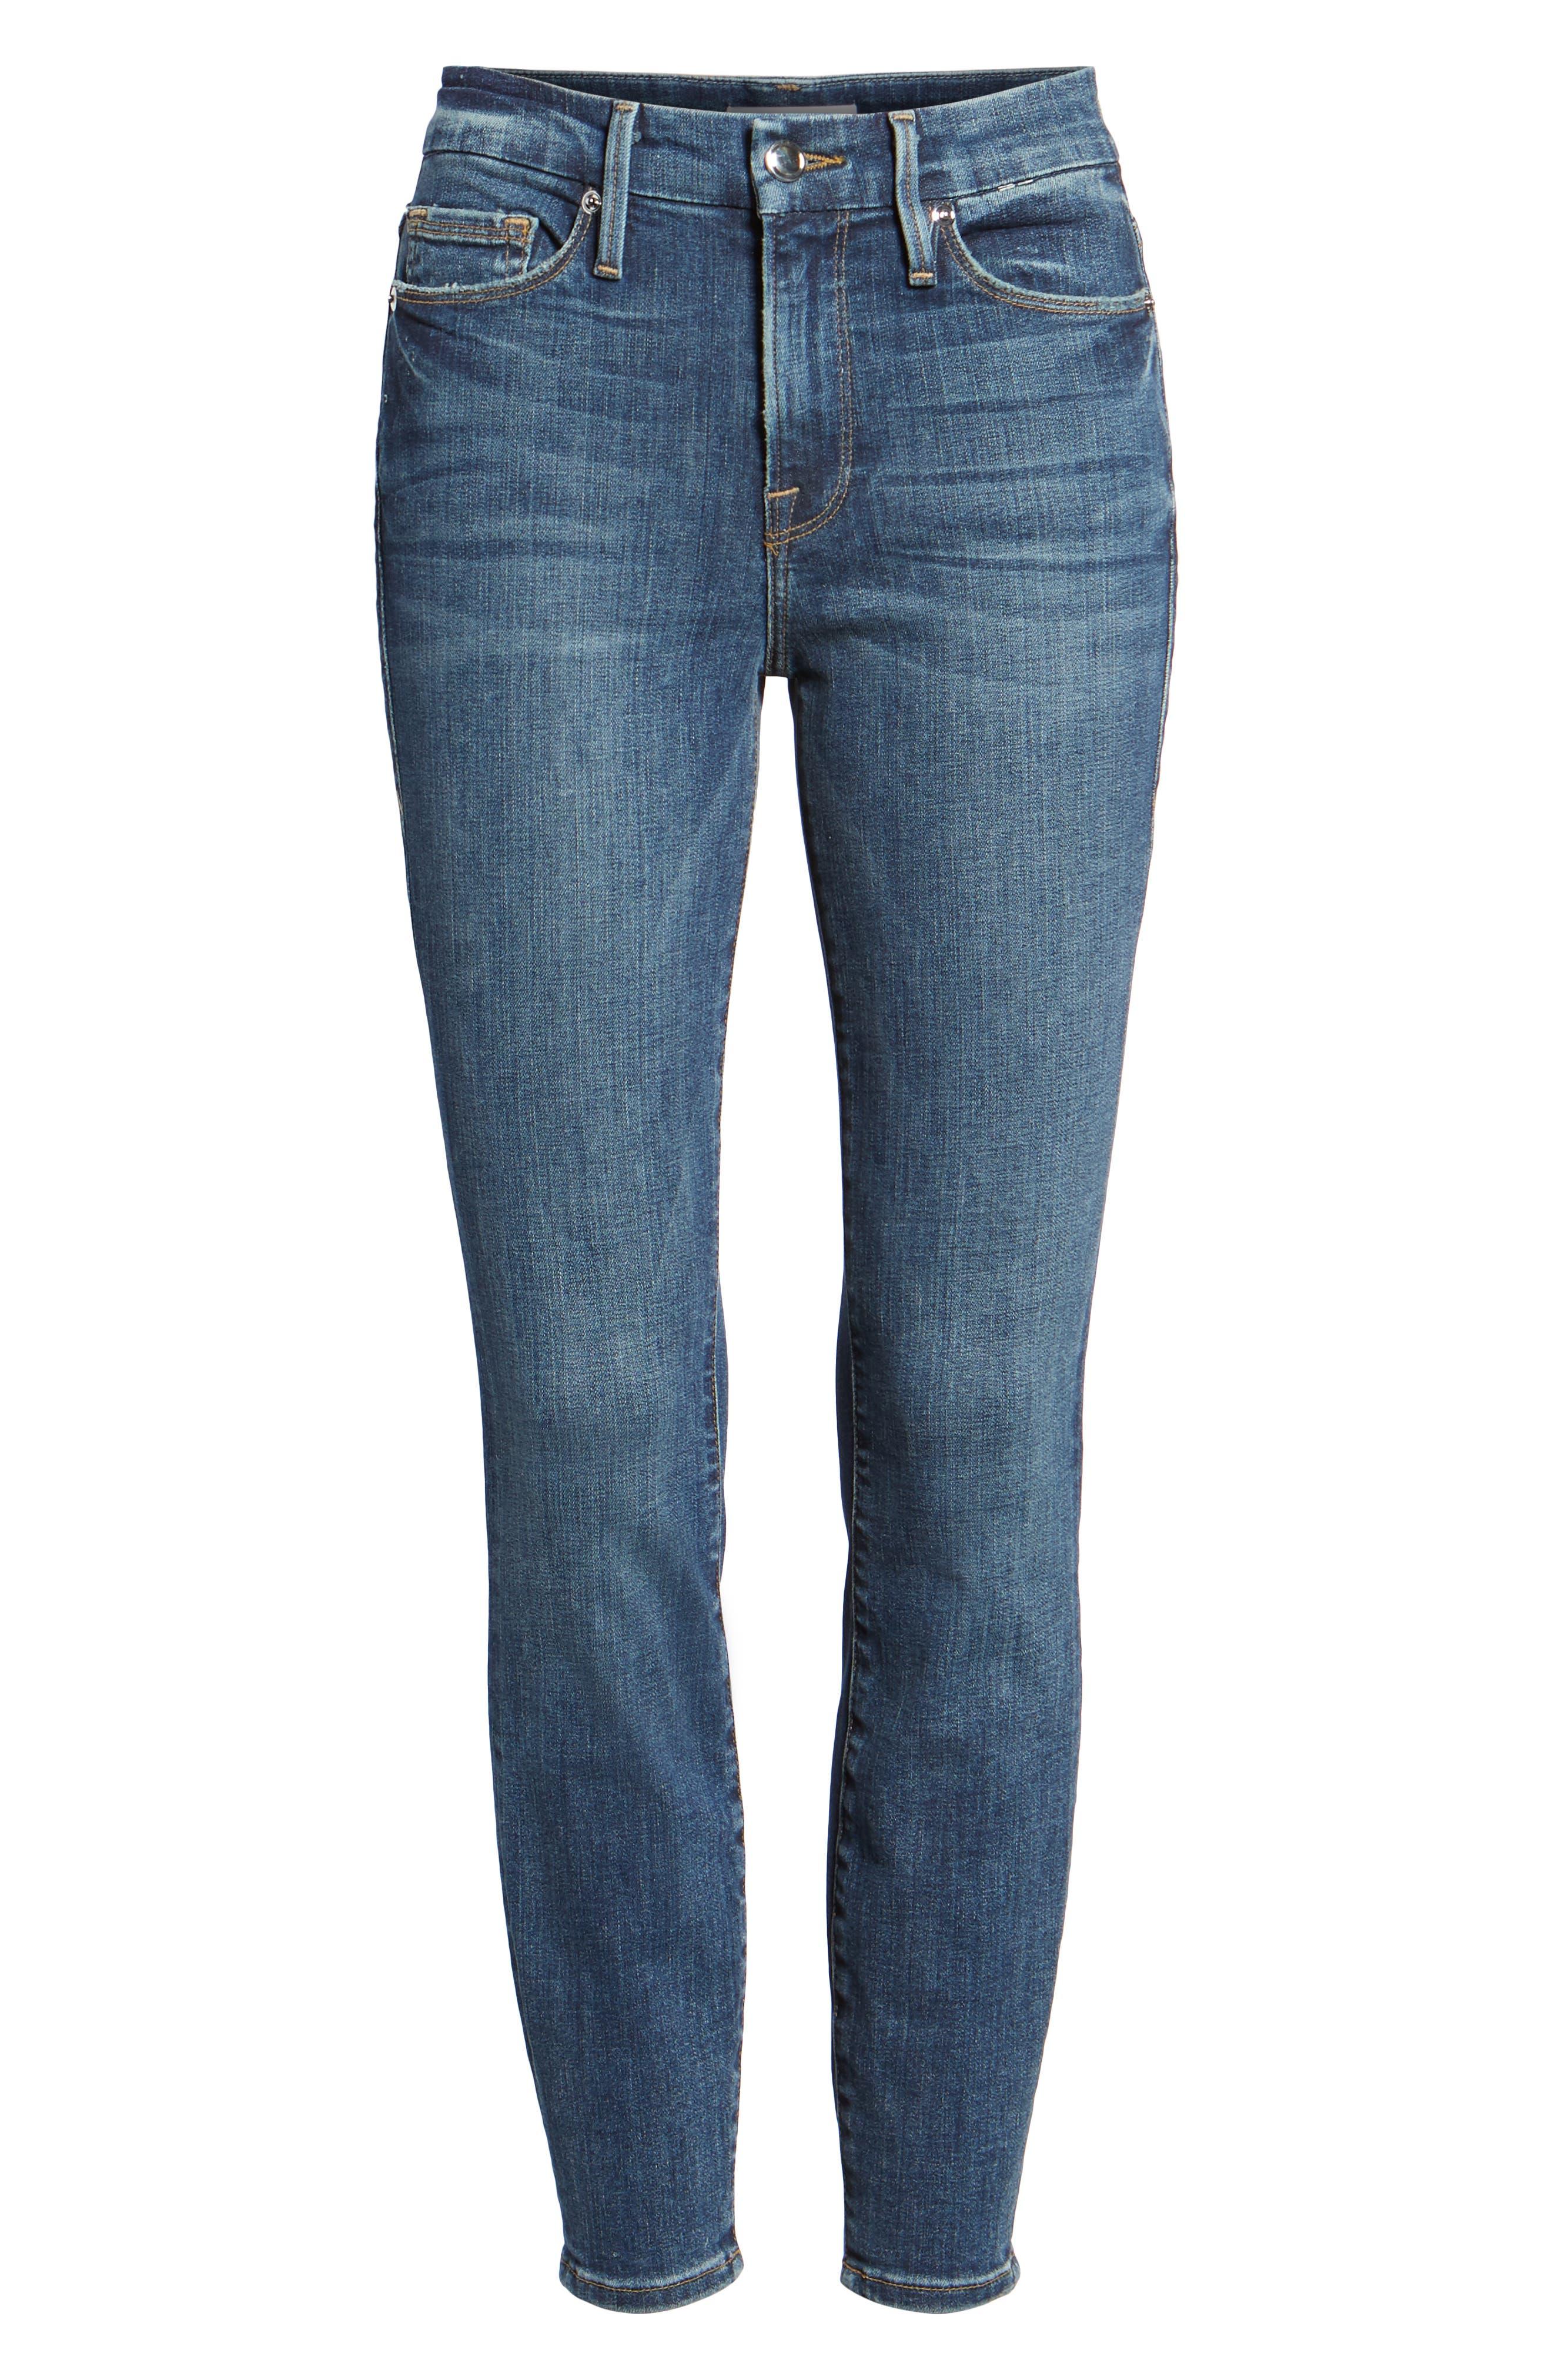 Crop high waist Skinny Jeans blue